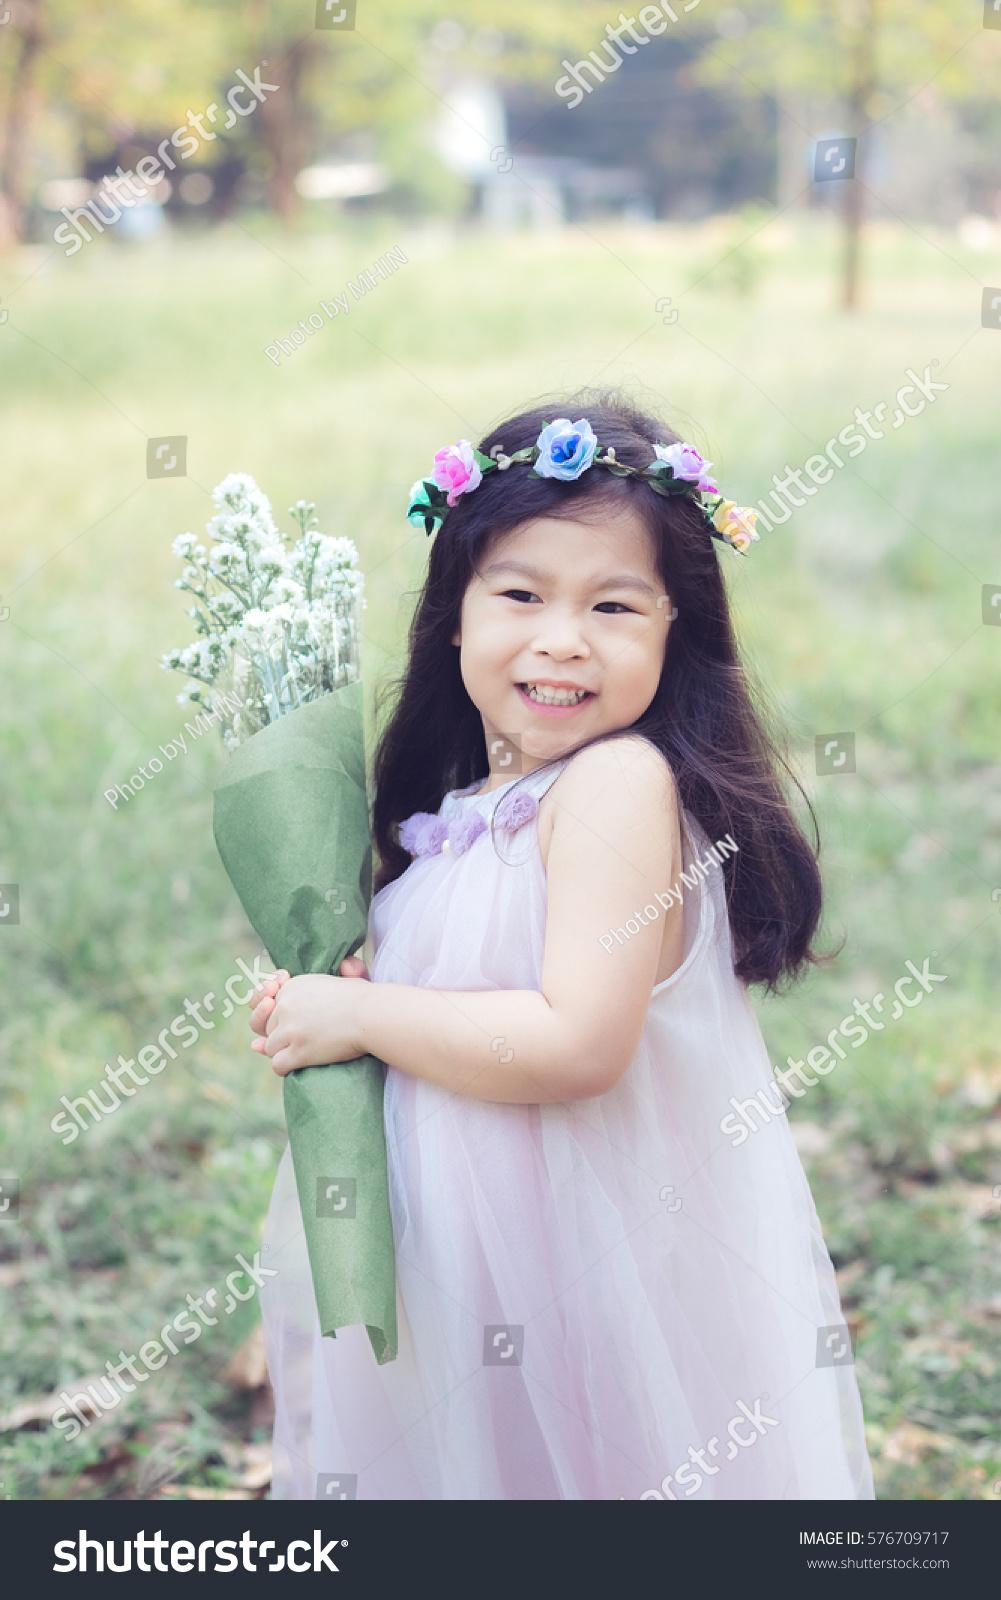 Asian little cute girl flower crown stock photo download now asian little cute girl with flower crown in the garden izmirmasajfo